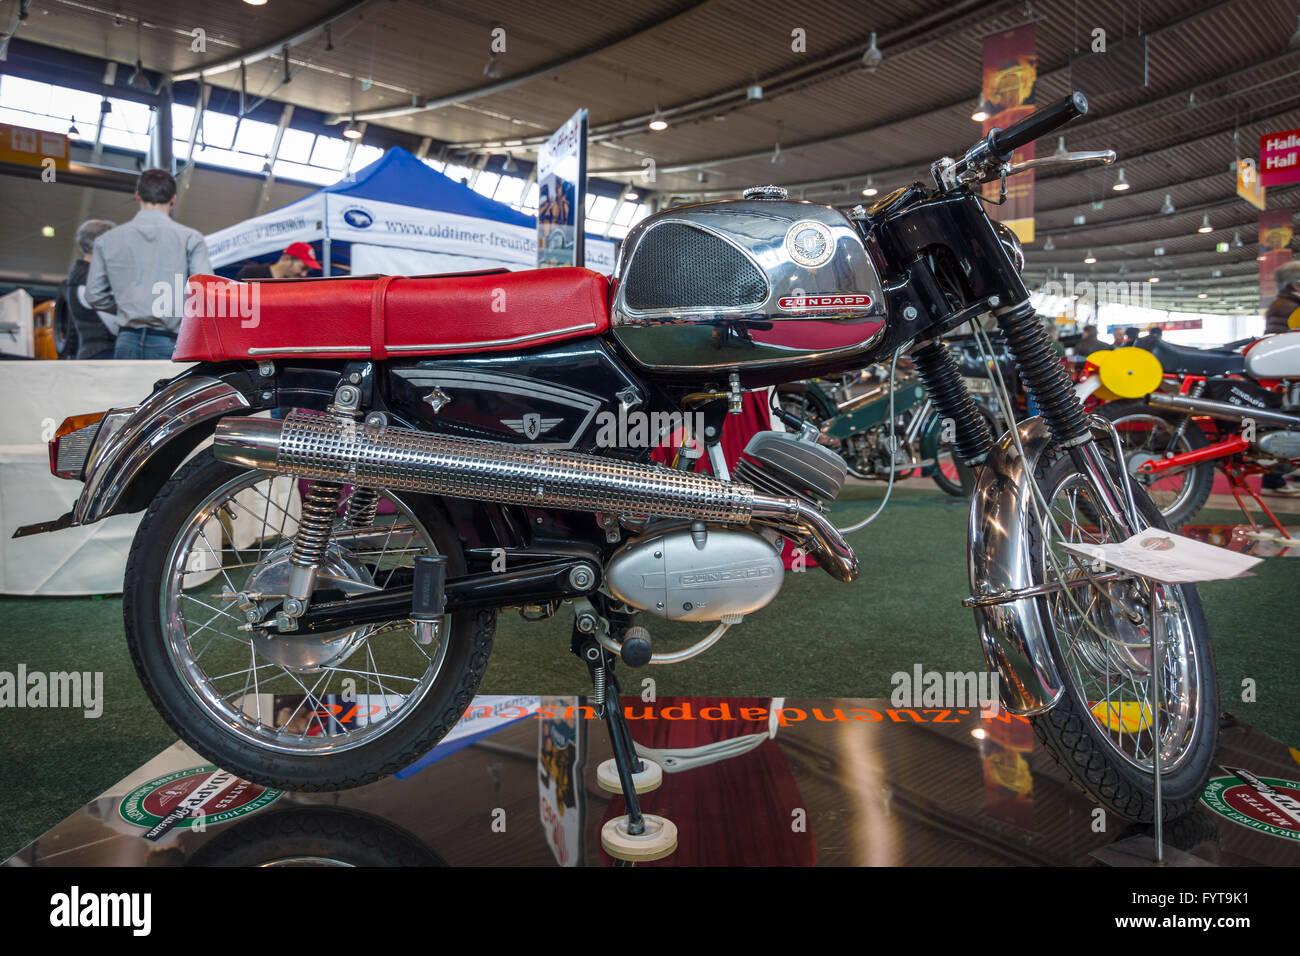 motorrad z ndapp ks 50 super sport 1969 stockfoto bild 103181989 alamy. Black Bedroom Furniture Sets. Home Design Ideas